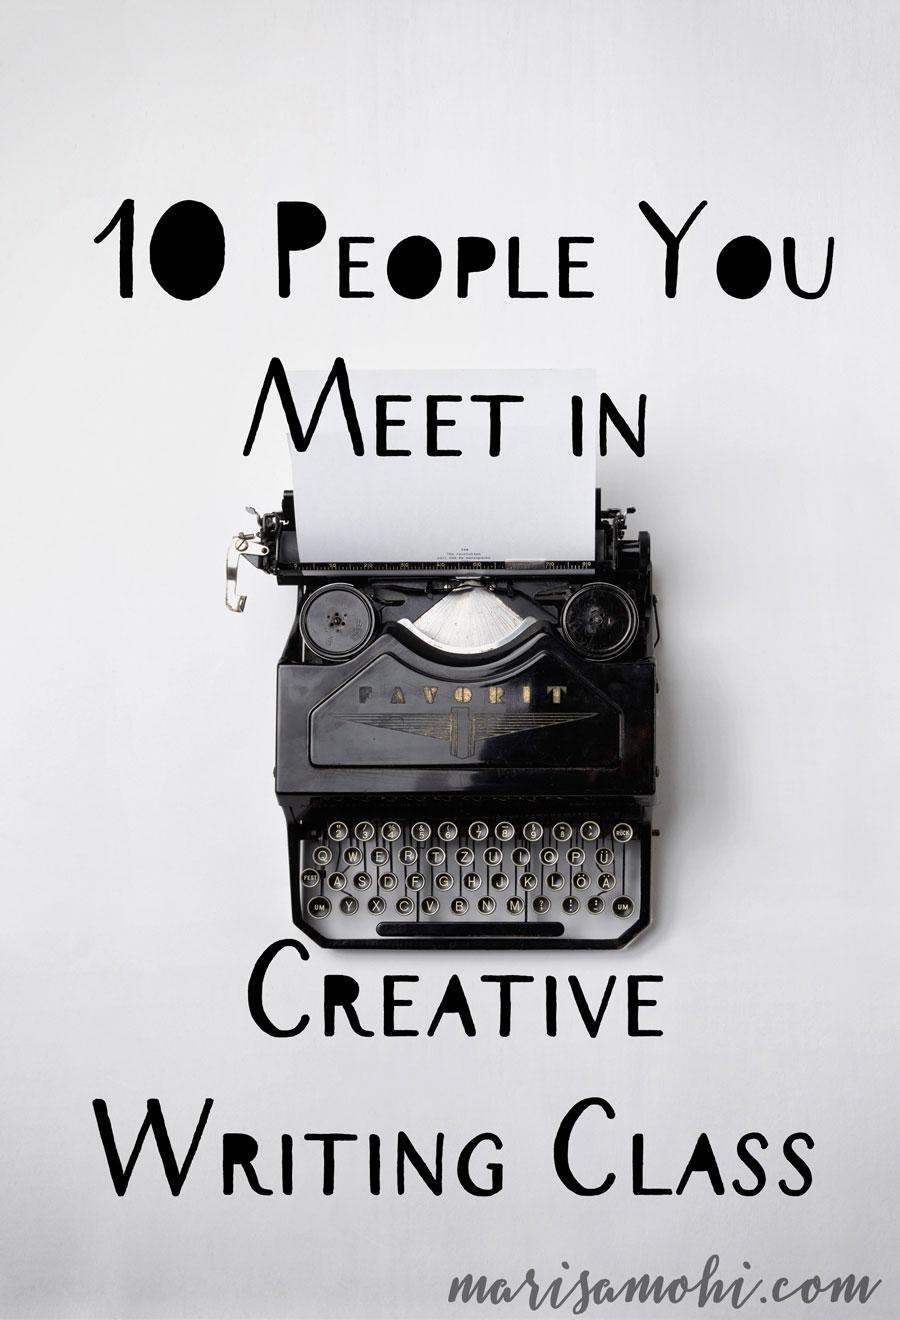 10 people you meet in creative writing class